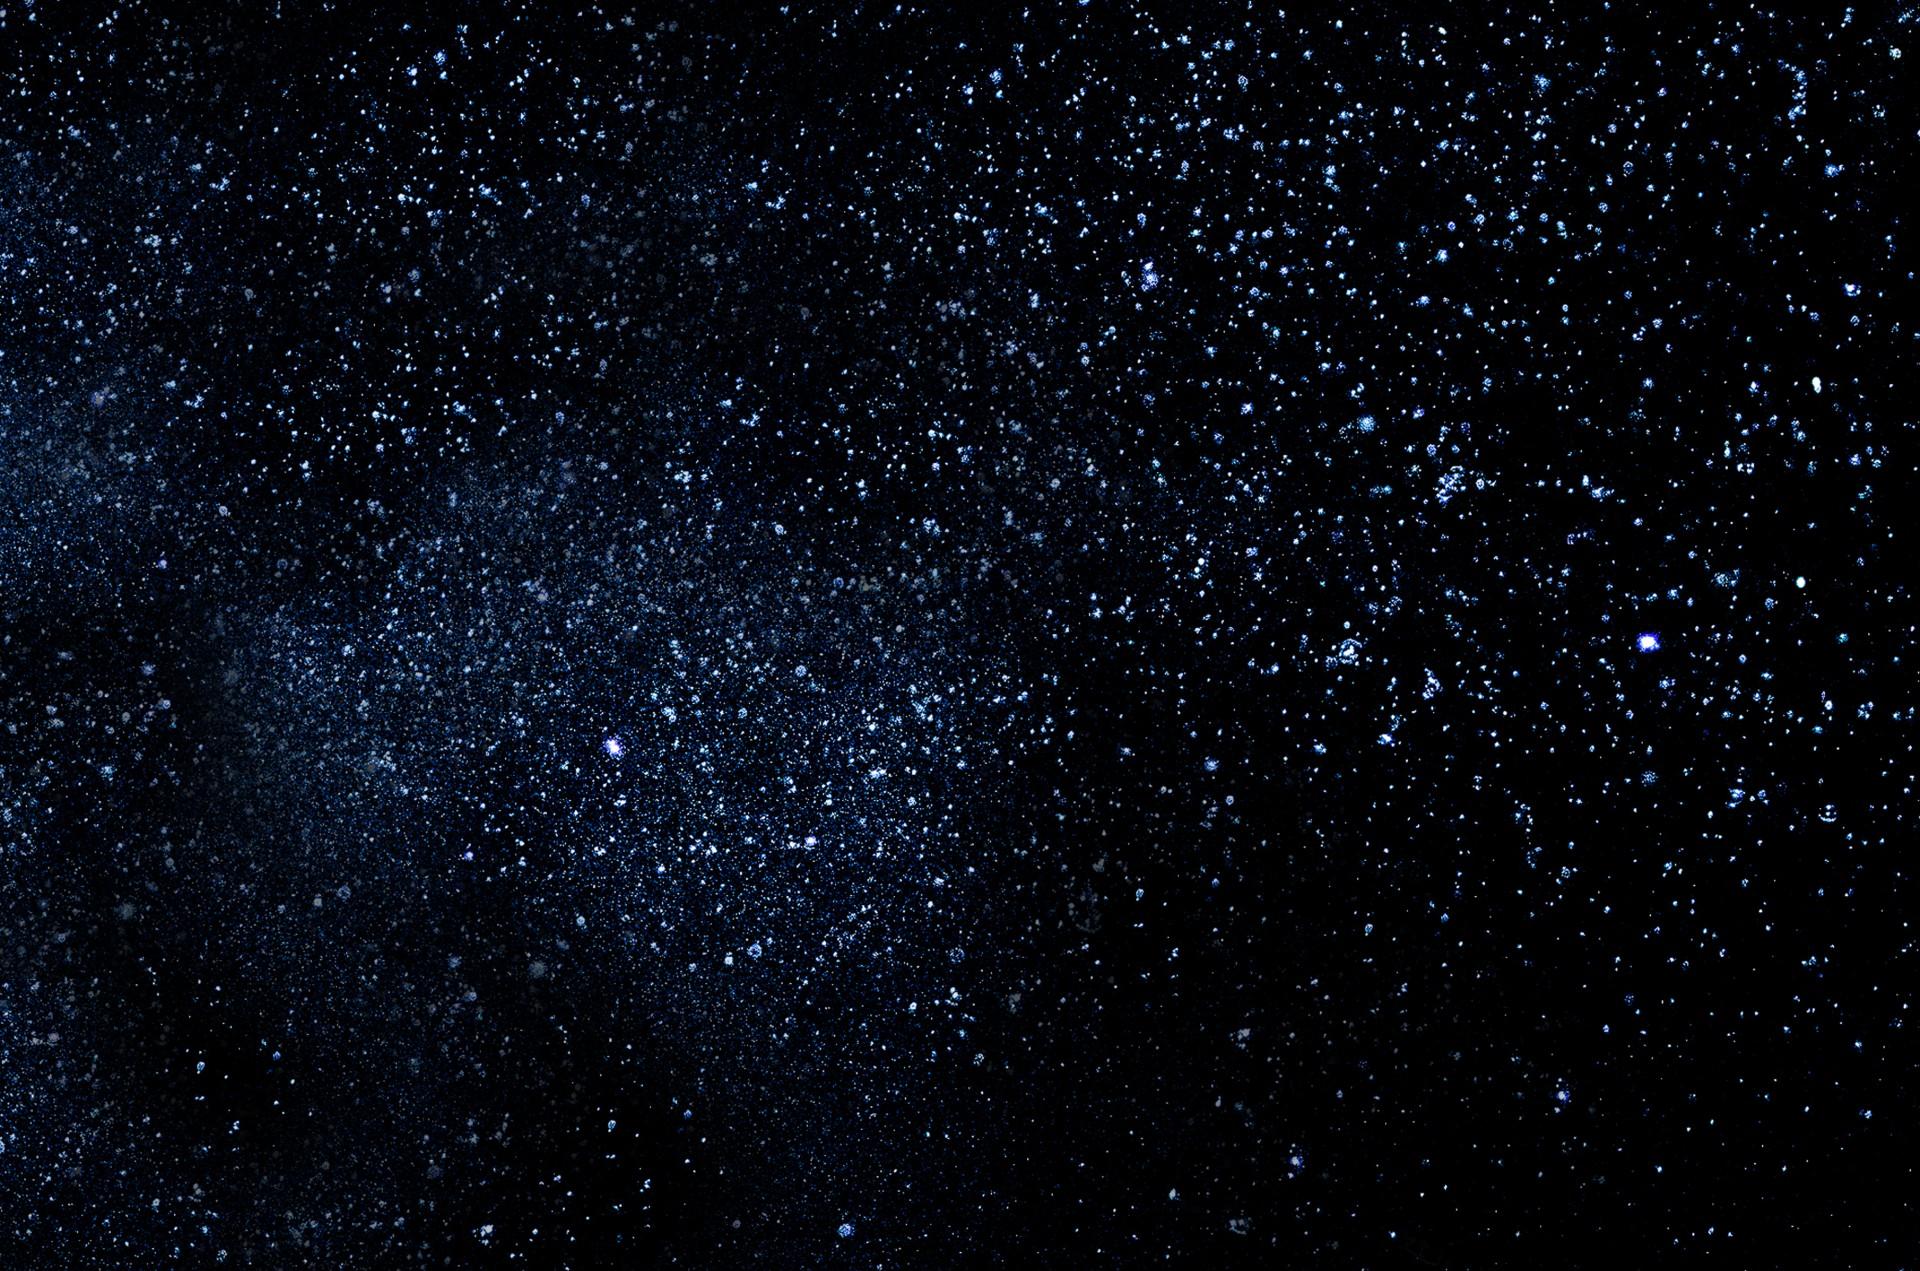 Stars In The Night Sky Free Stock Photo